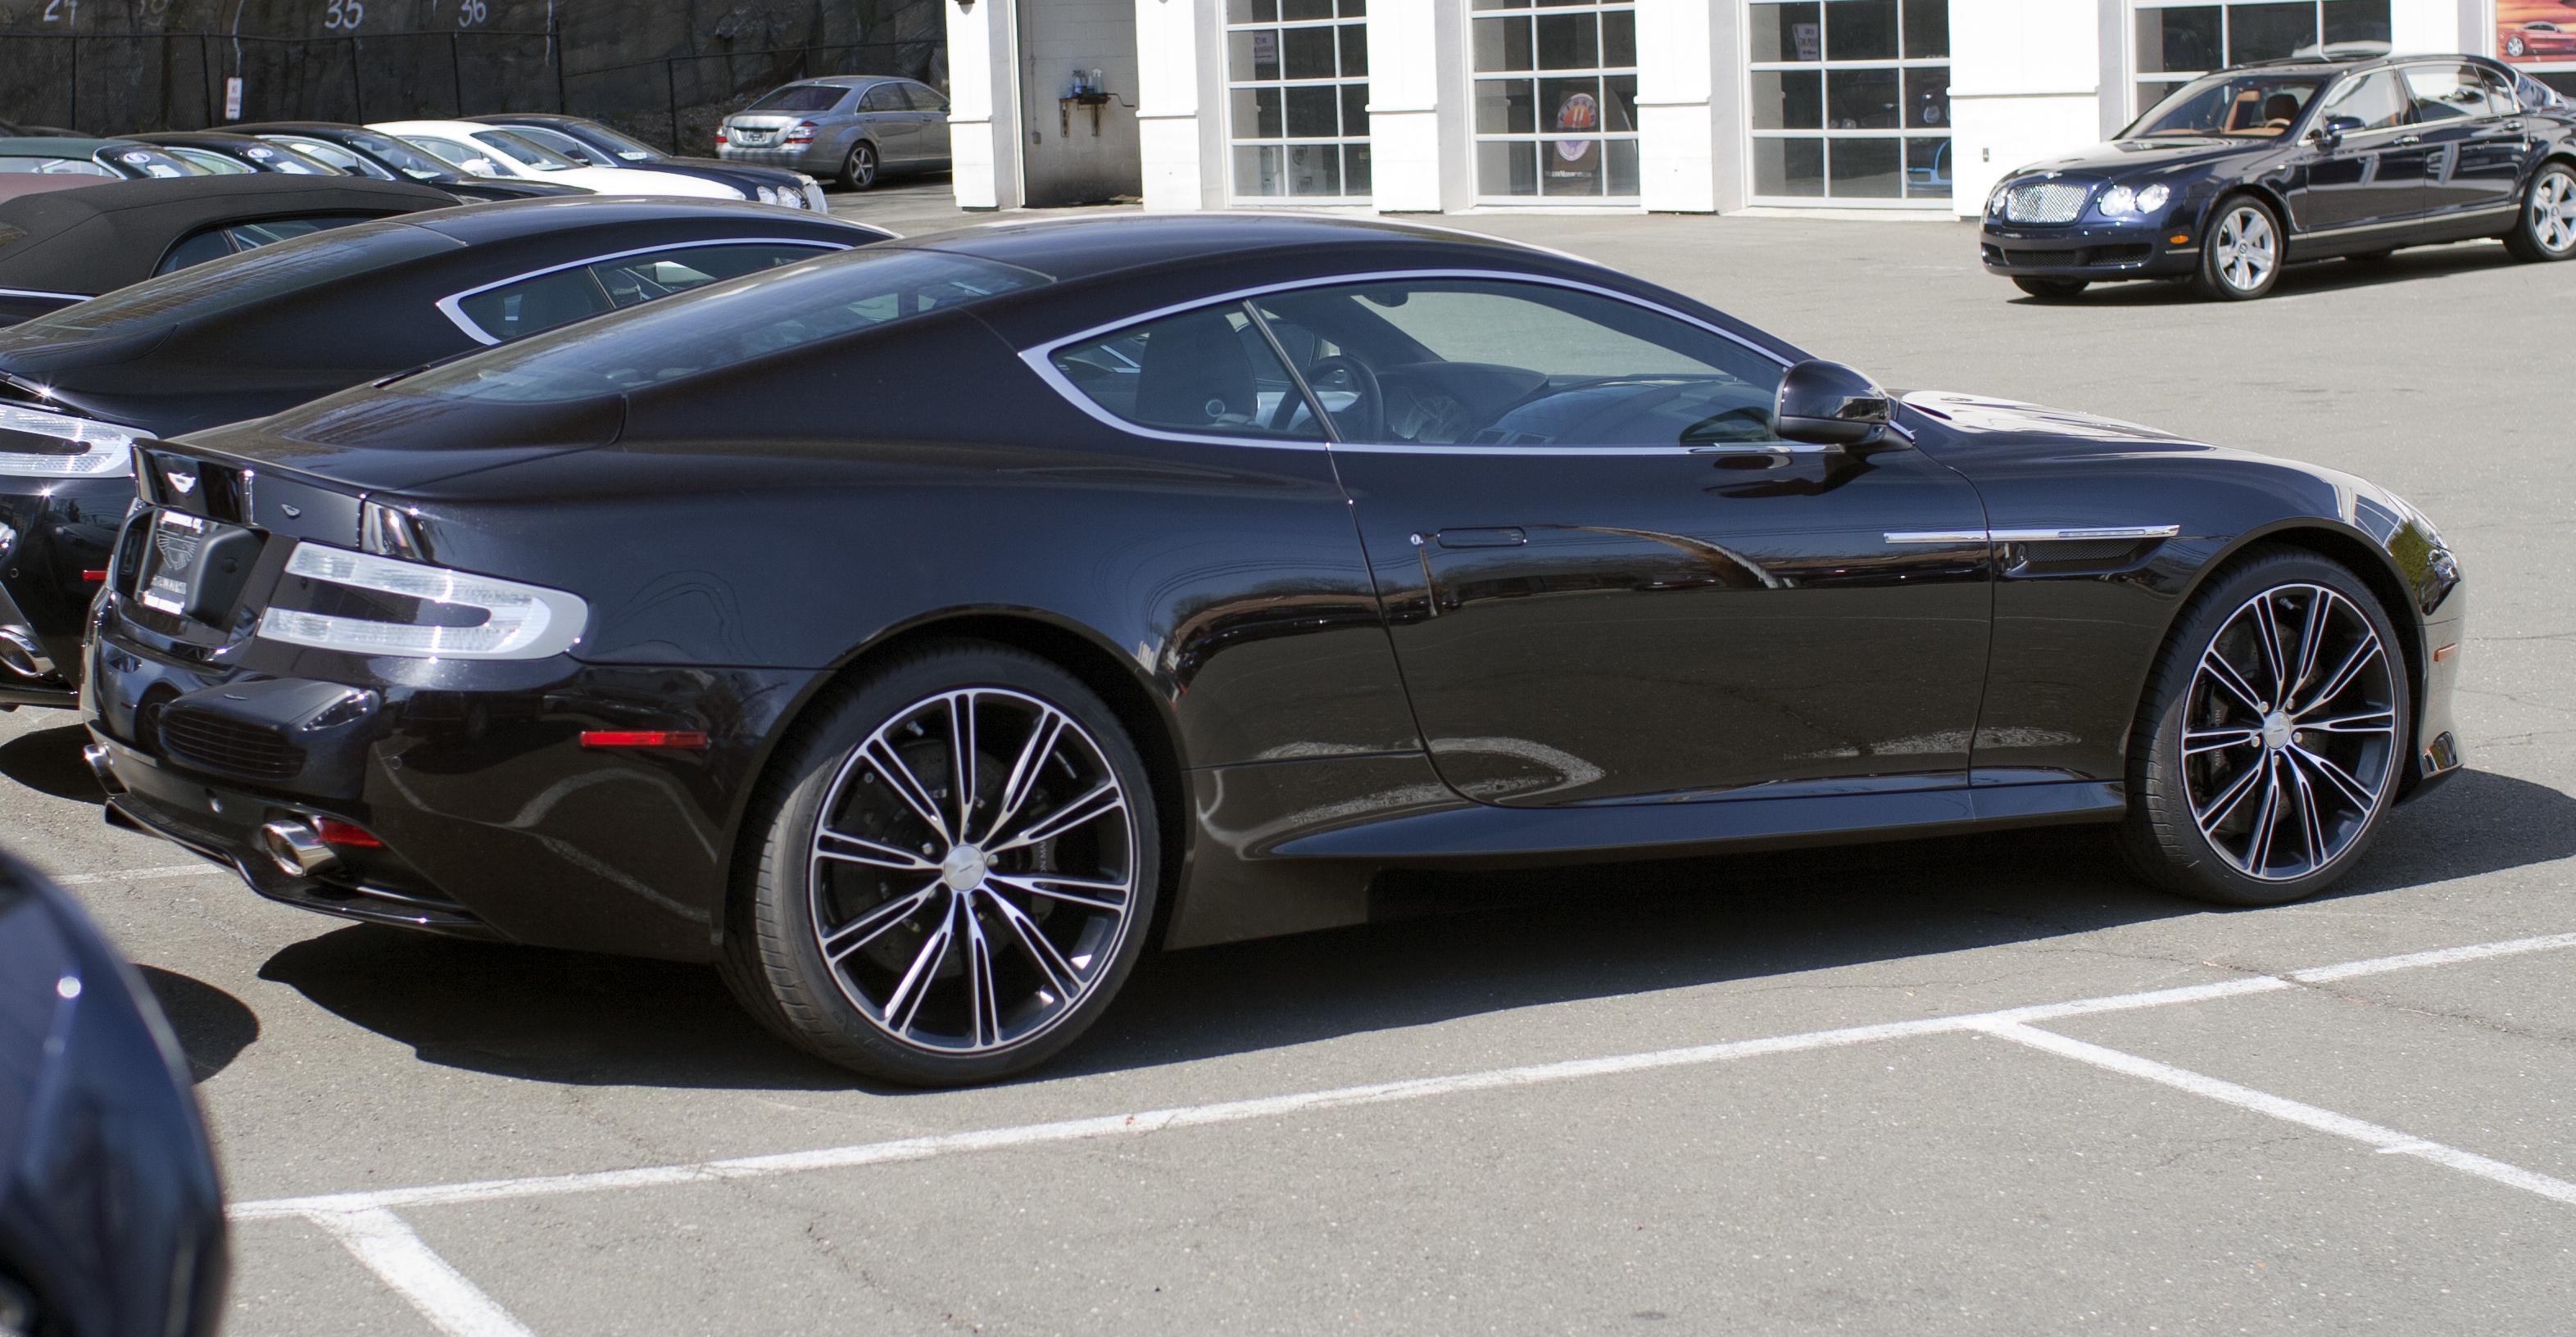 Aston Martin Virage II 2011 - 2012 Coupe #2